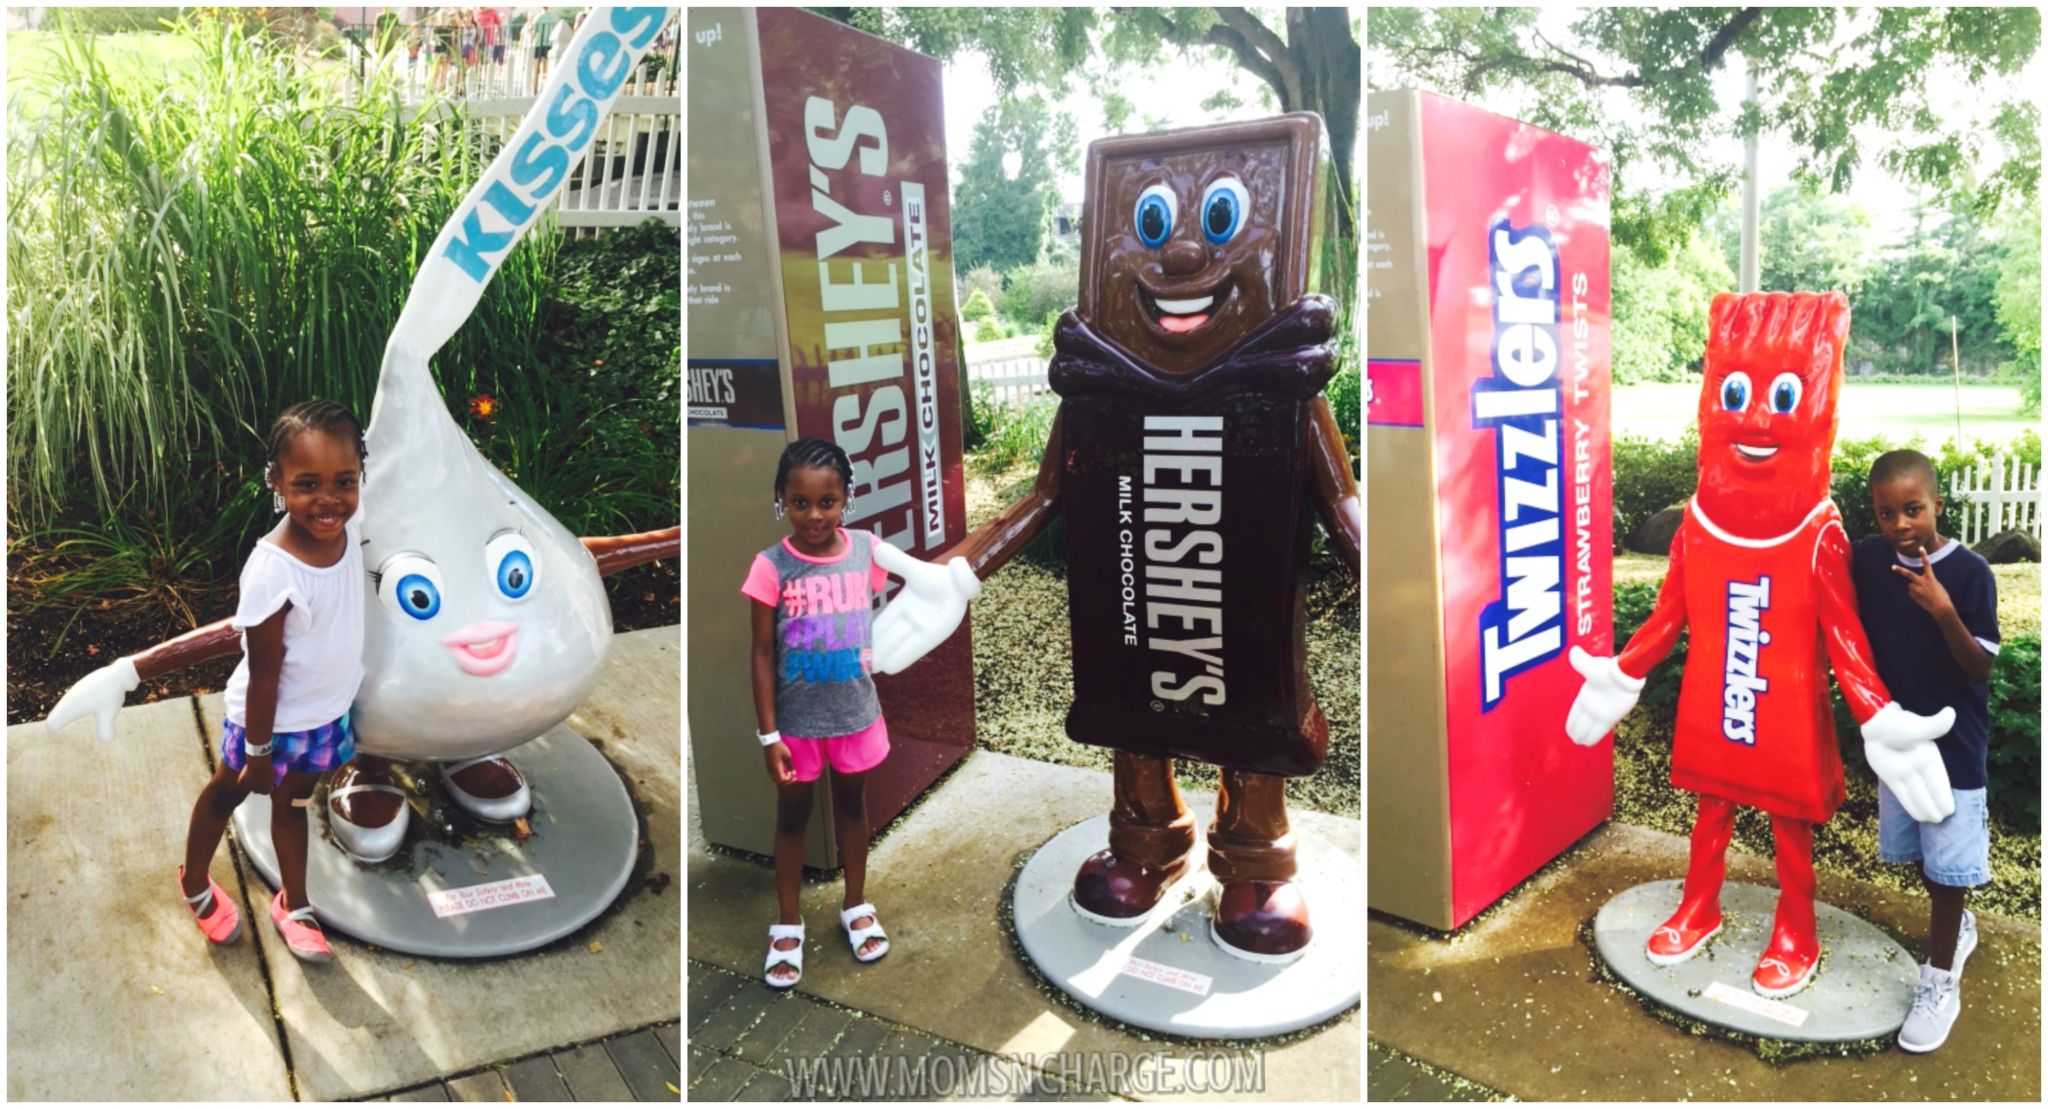 Hershey Park Rides Little Kids